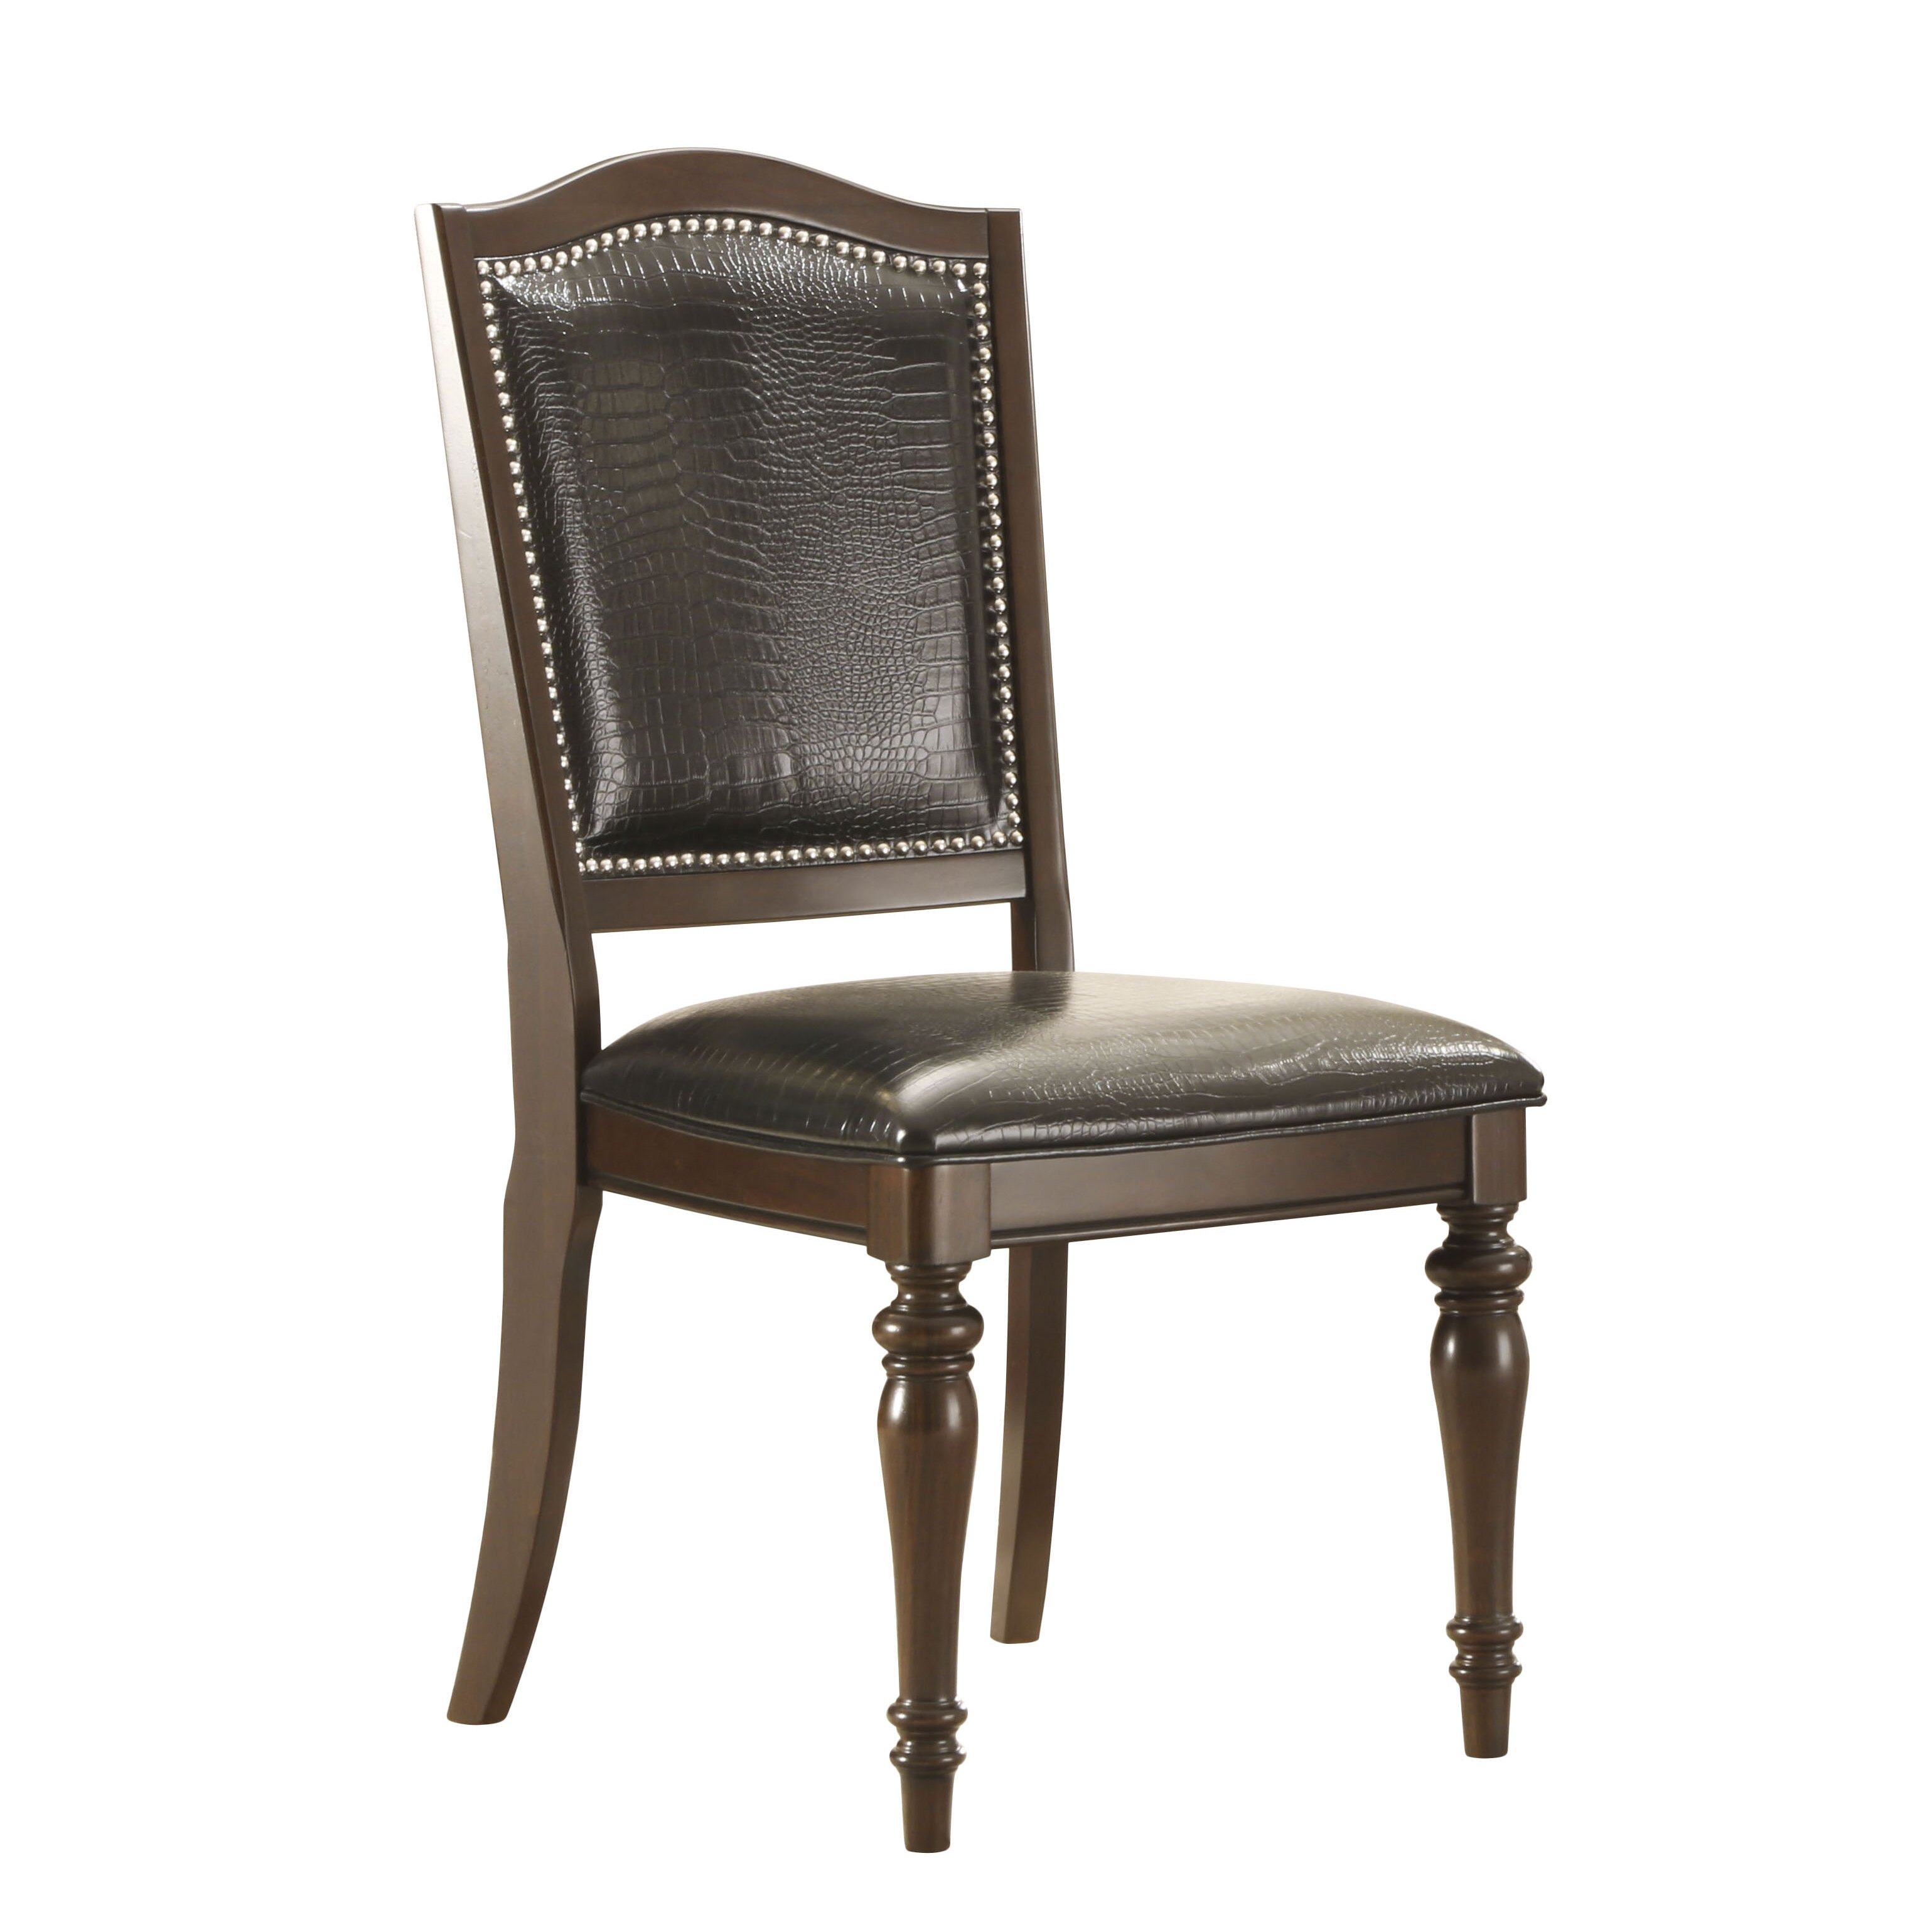 Darby home co hobart side chair reviews wayfair